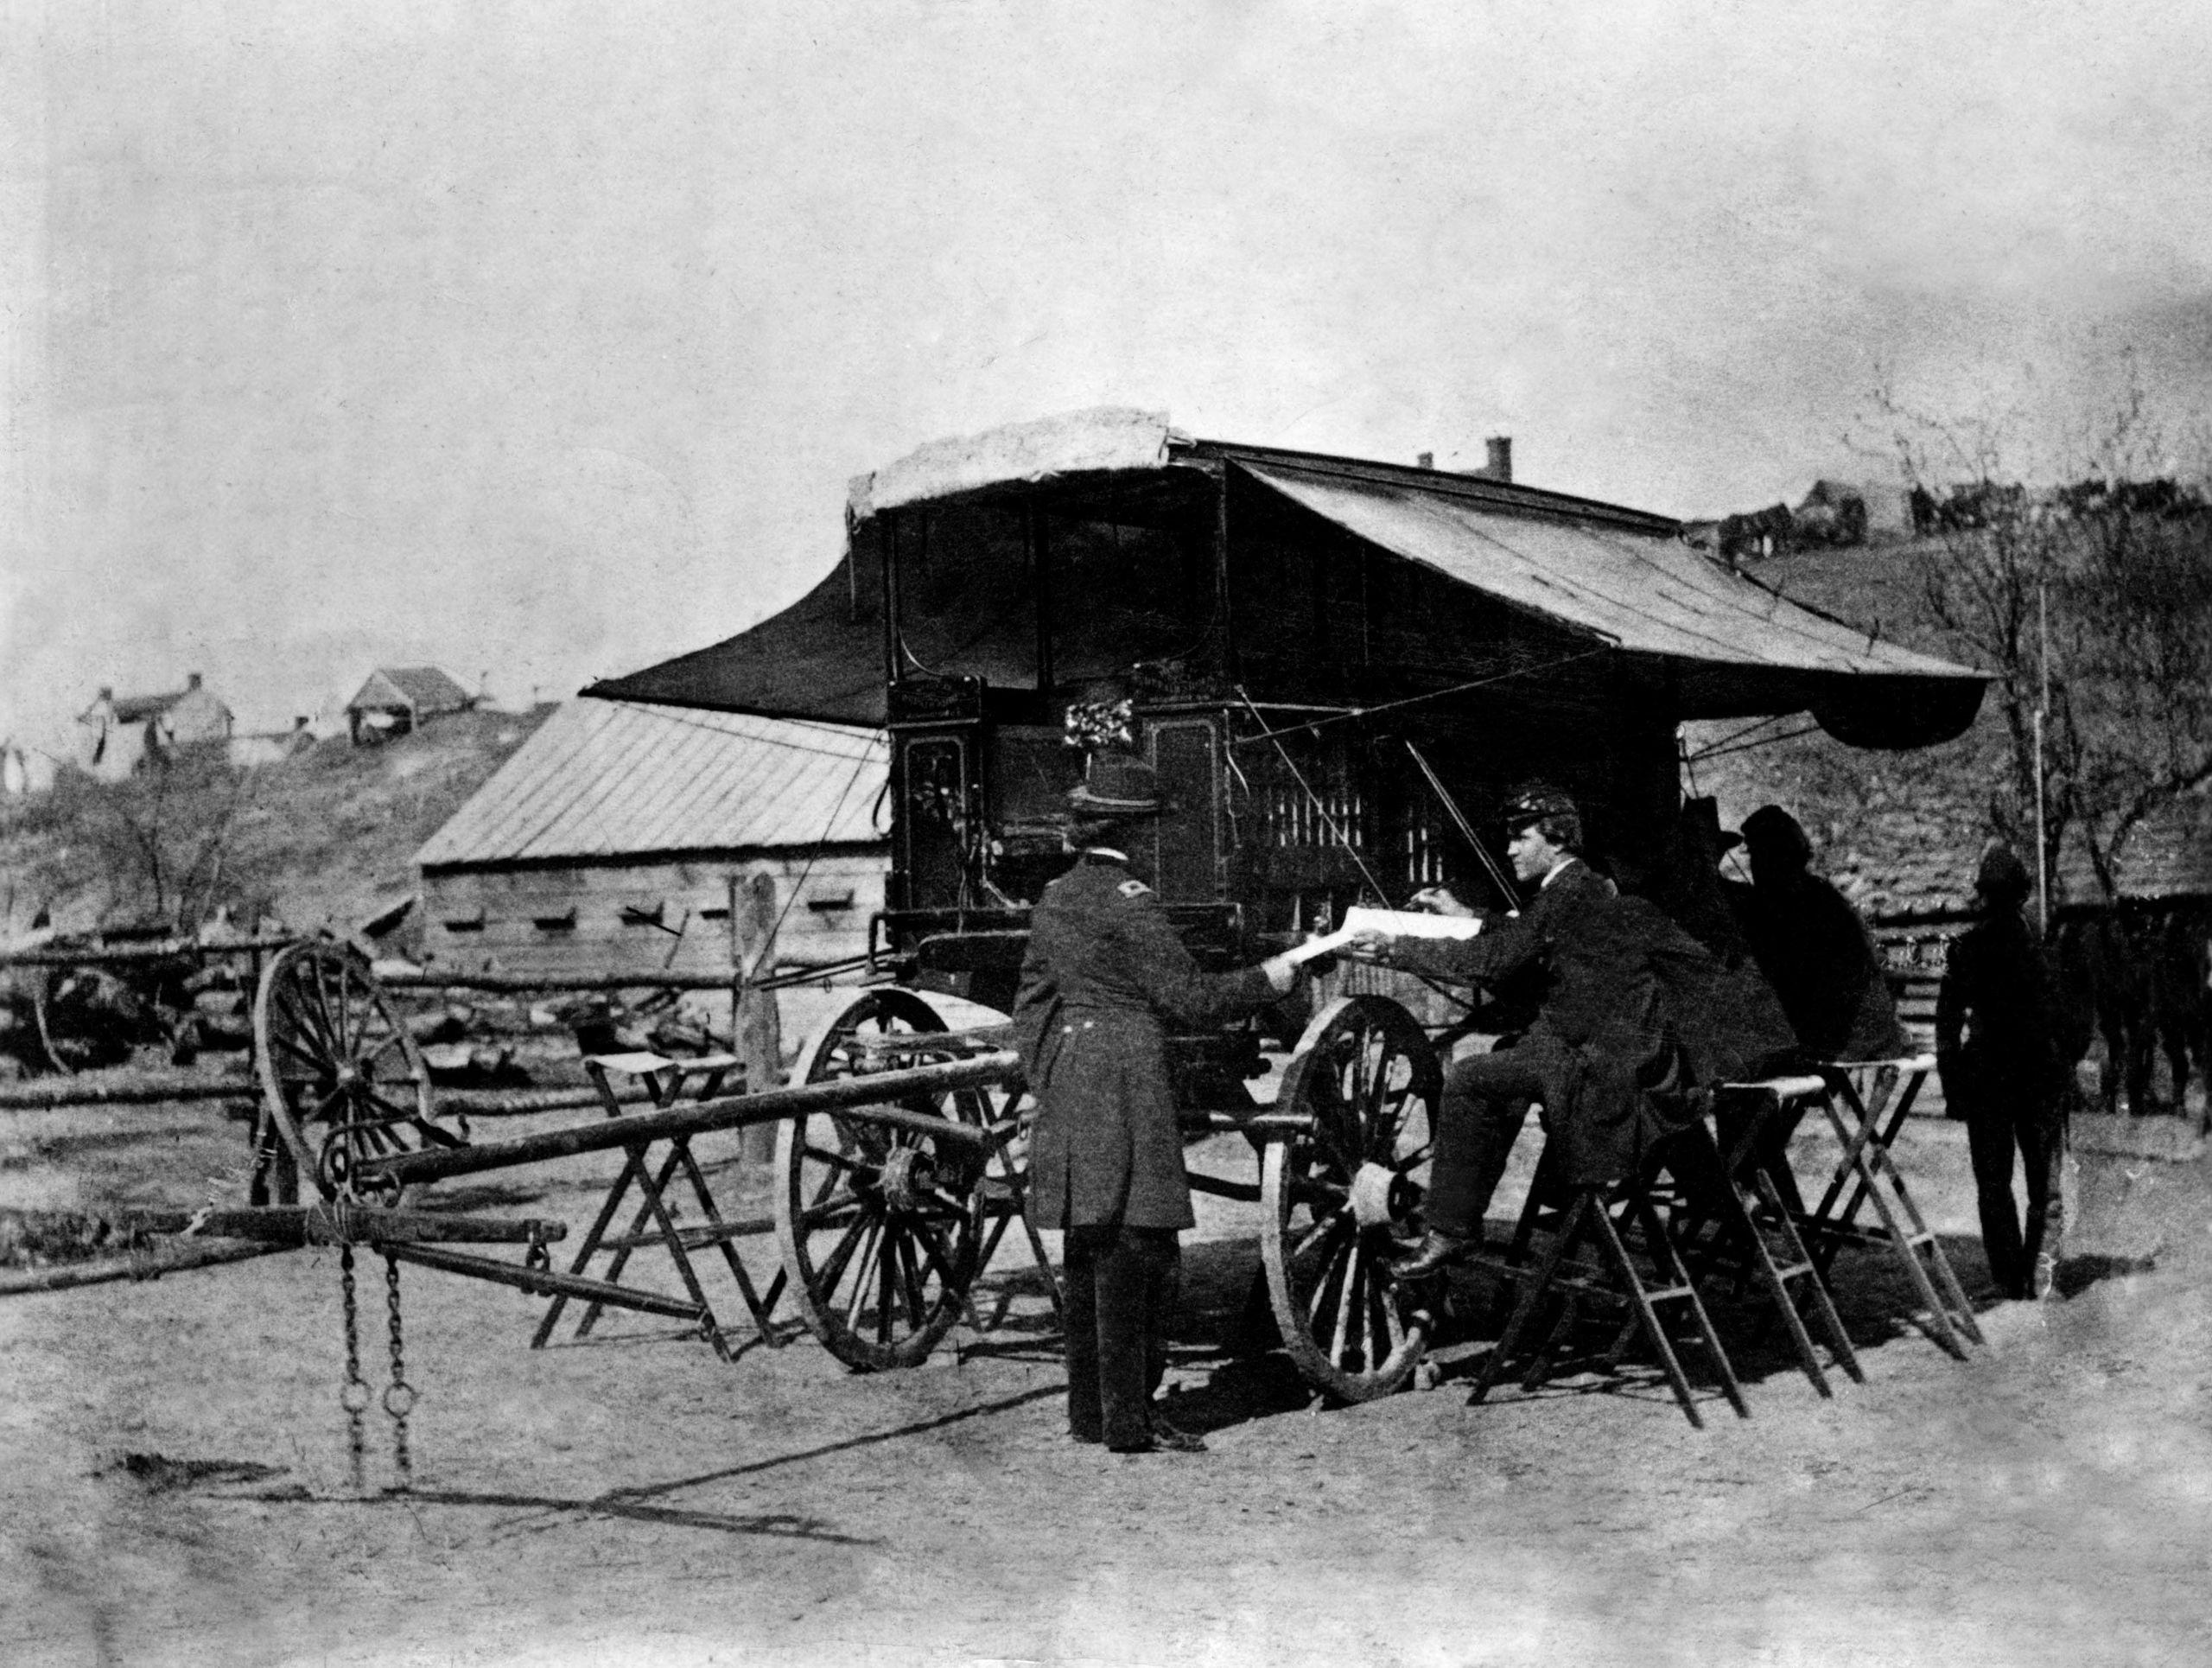 Ejército de Cumberland. Imagen de un cuartel móvil para controlar a las tropas